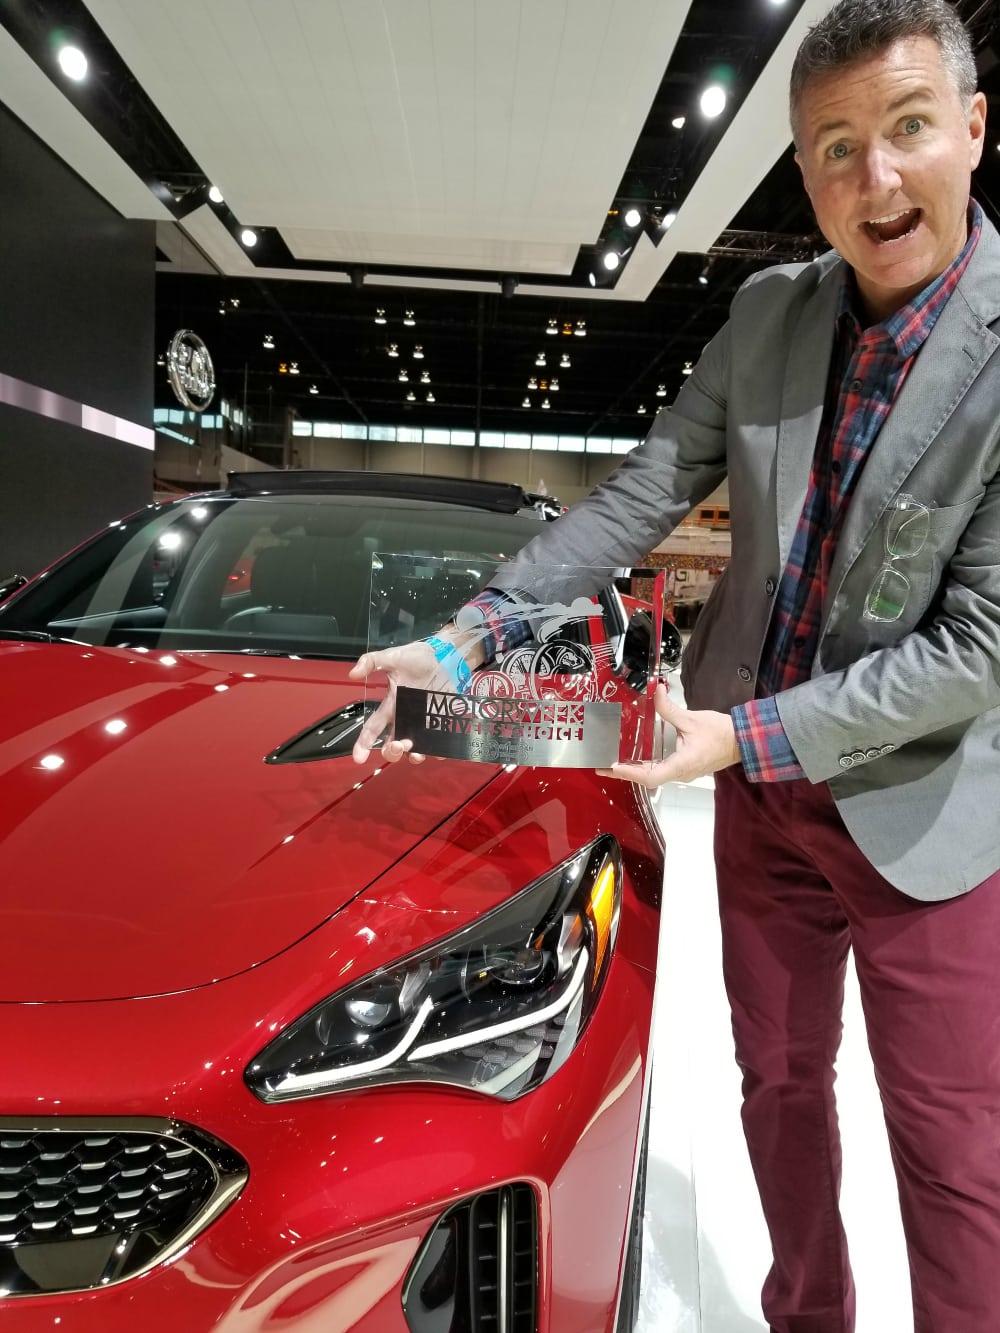 Kia at the Chicago Auto Show: A Story of Quality #events #chicago #auto #cars #kia #autoshow